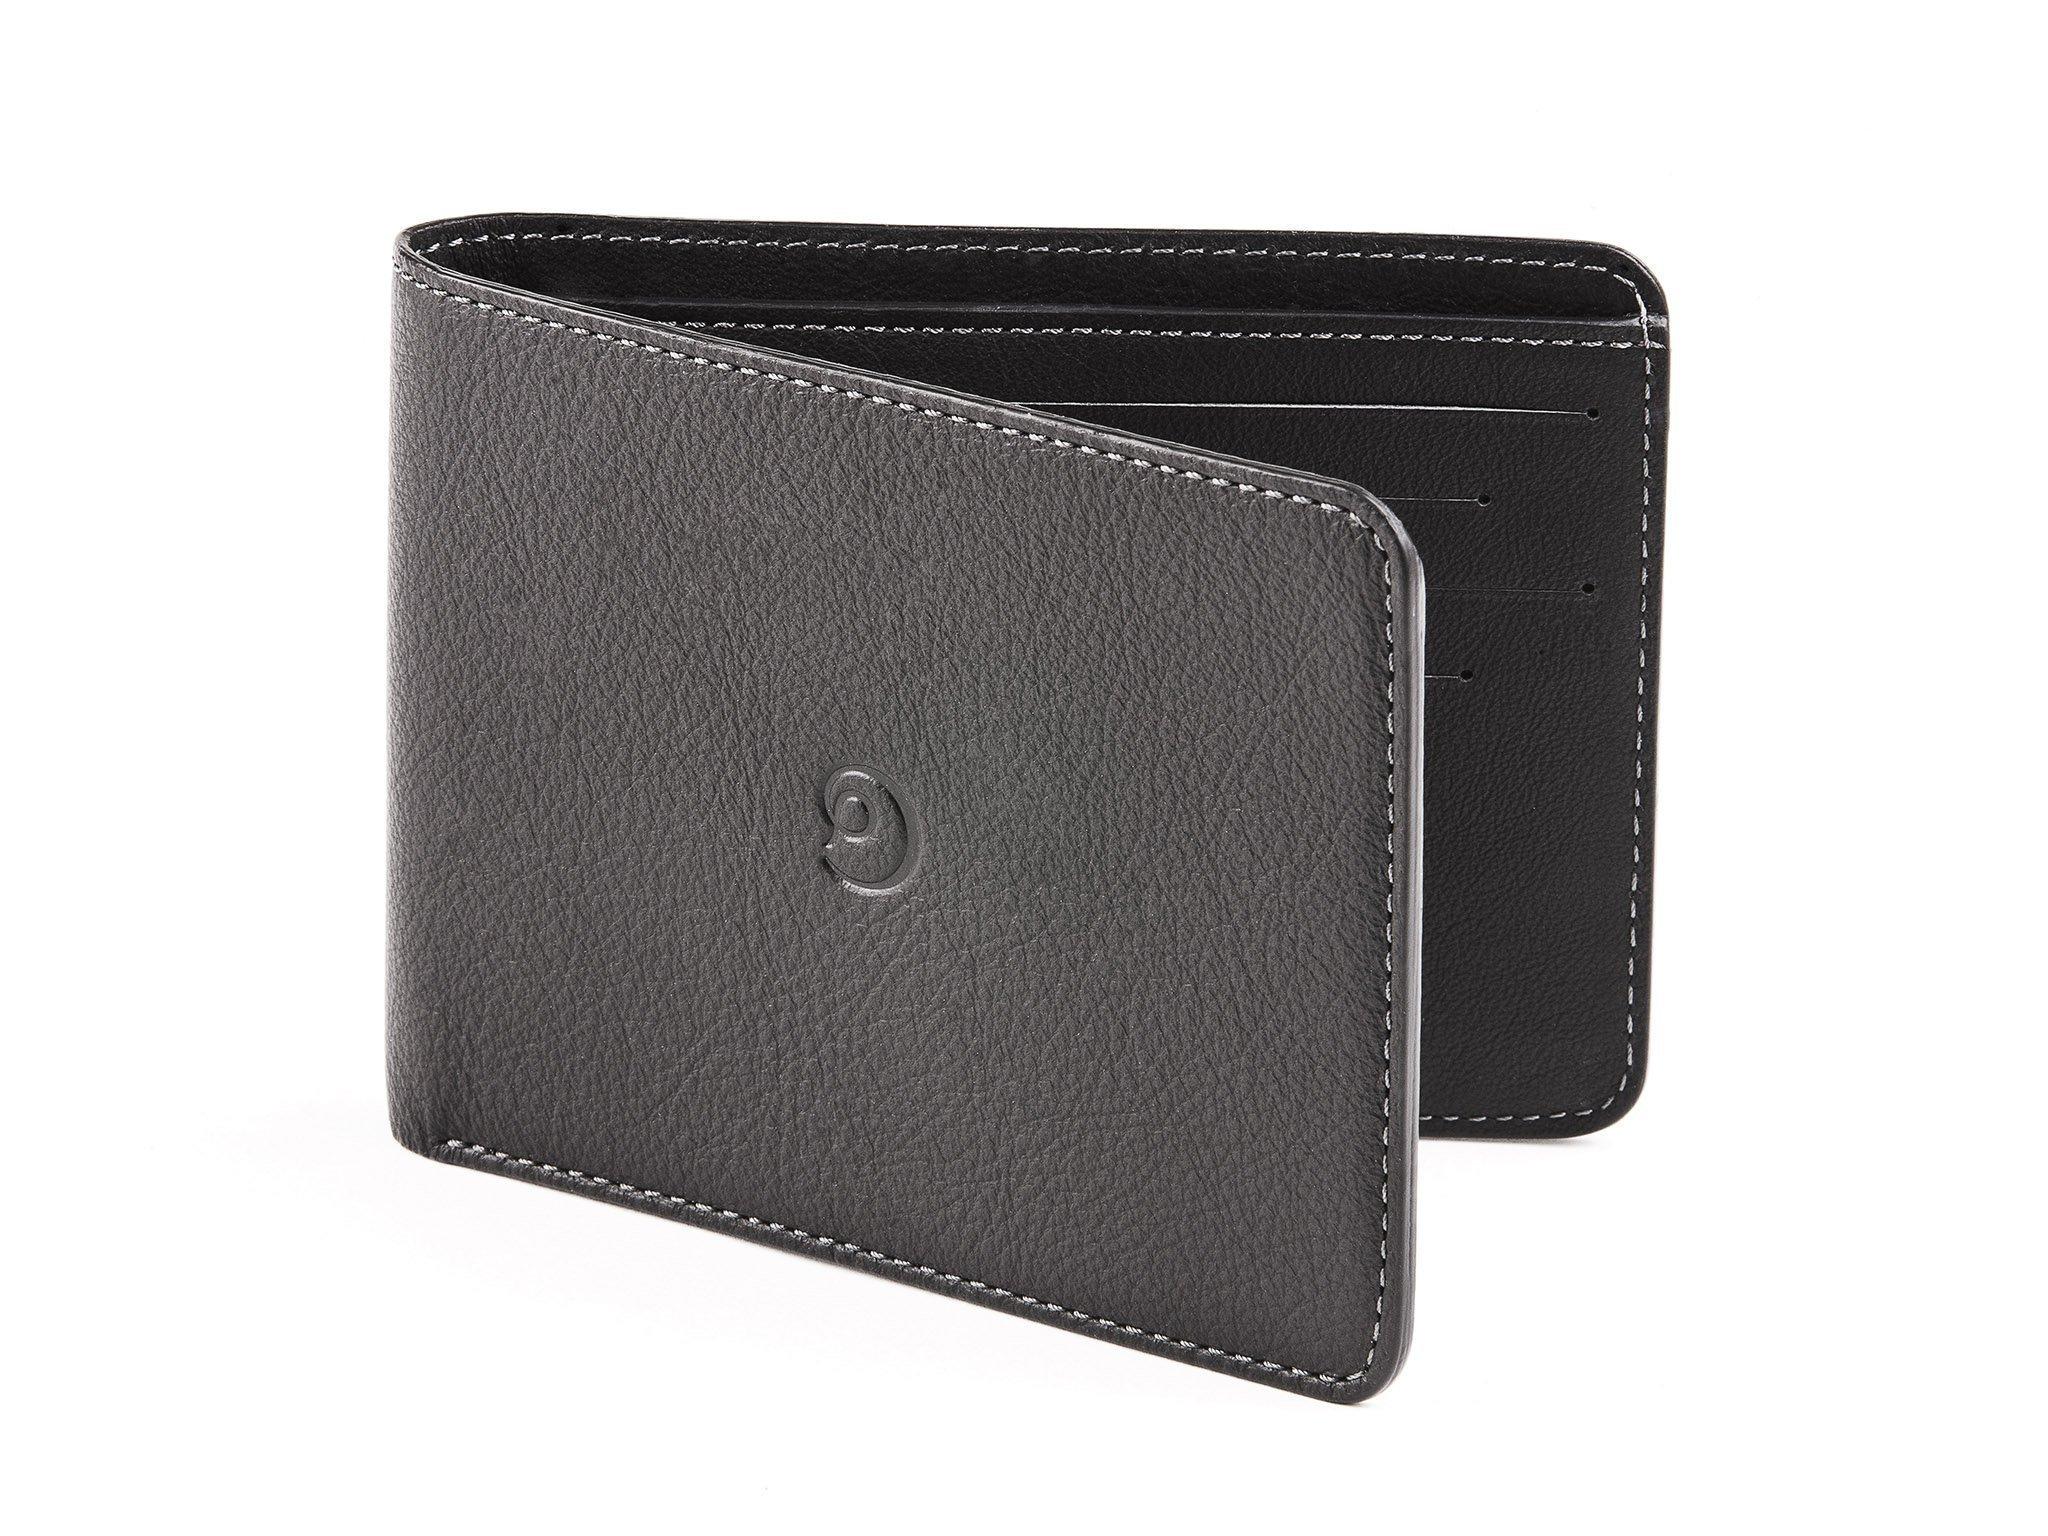 Slim Leather Wallet for Men by Danny P. (Black)